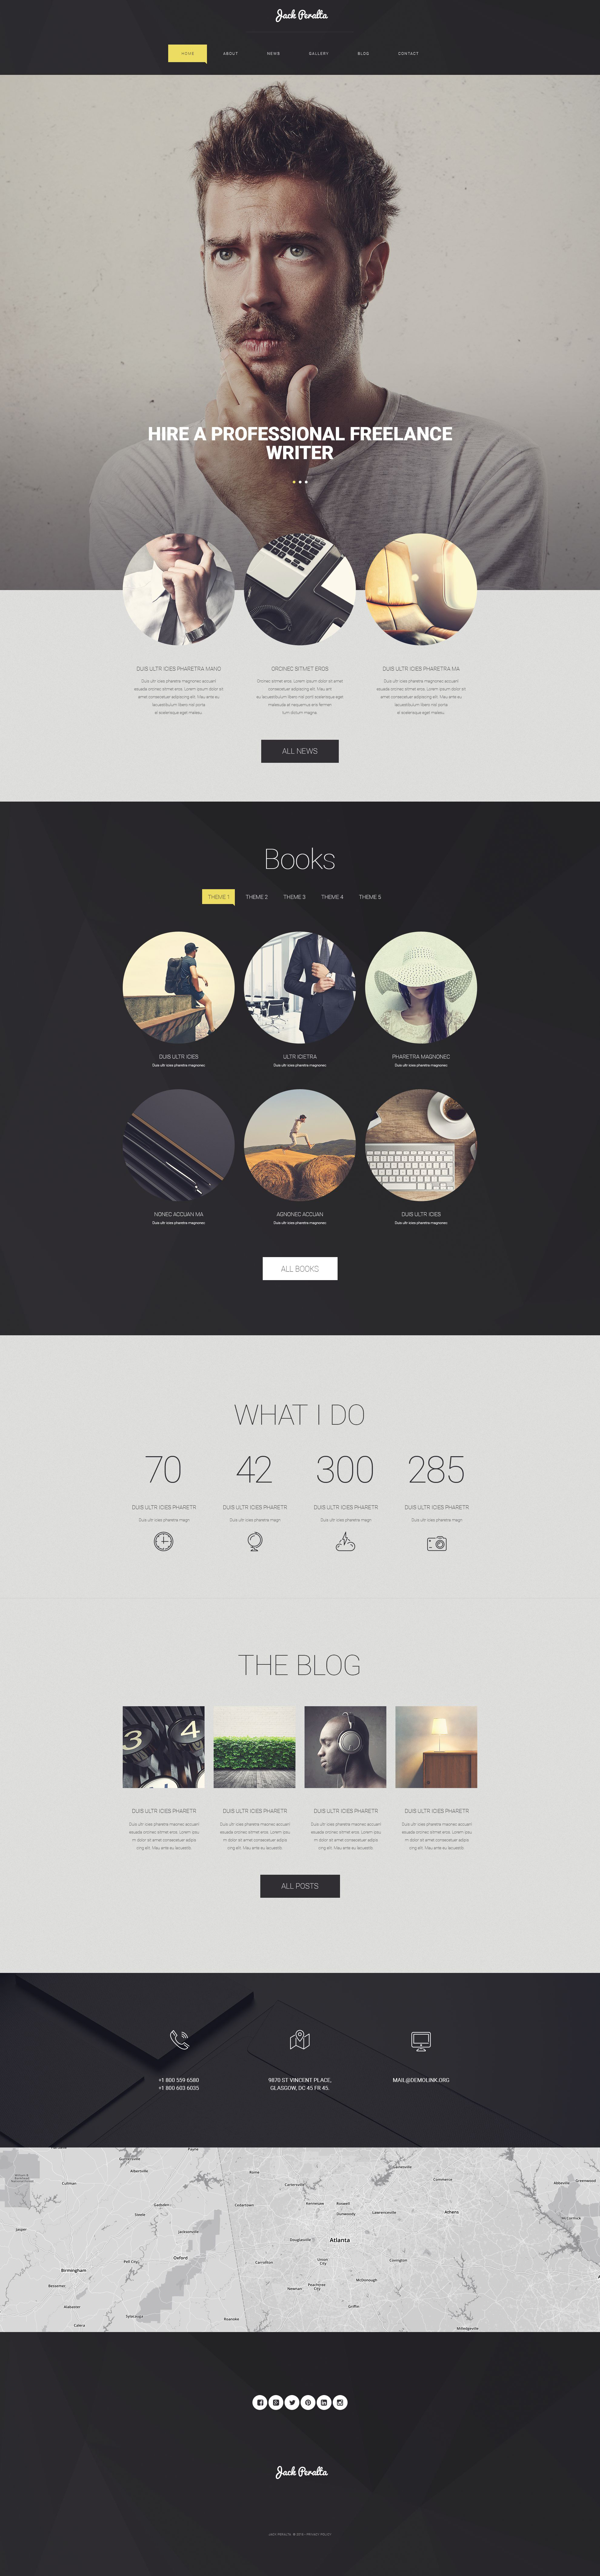 Responsivt Freelance Writer WordPress-tema #54585 - skärmbild